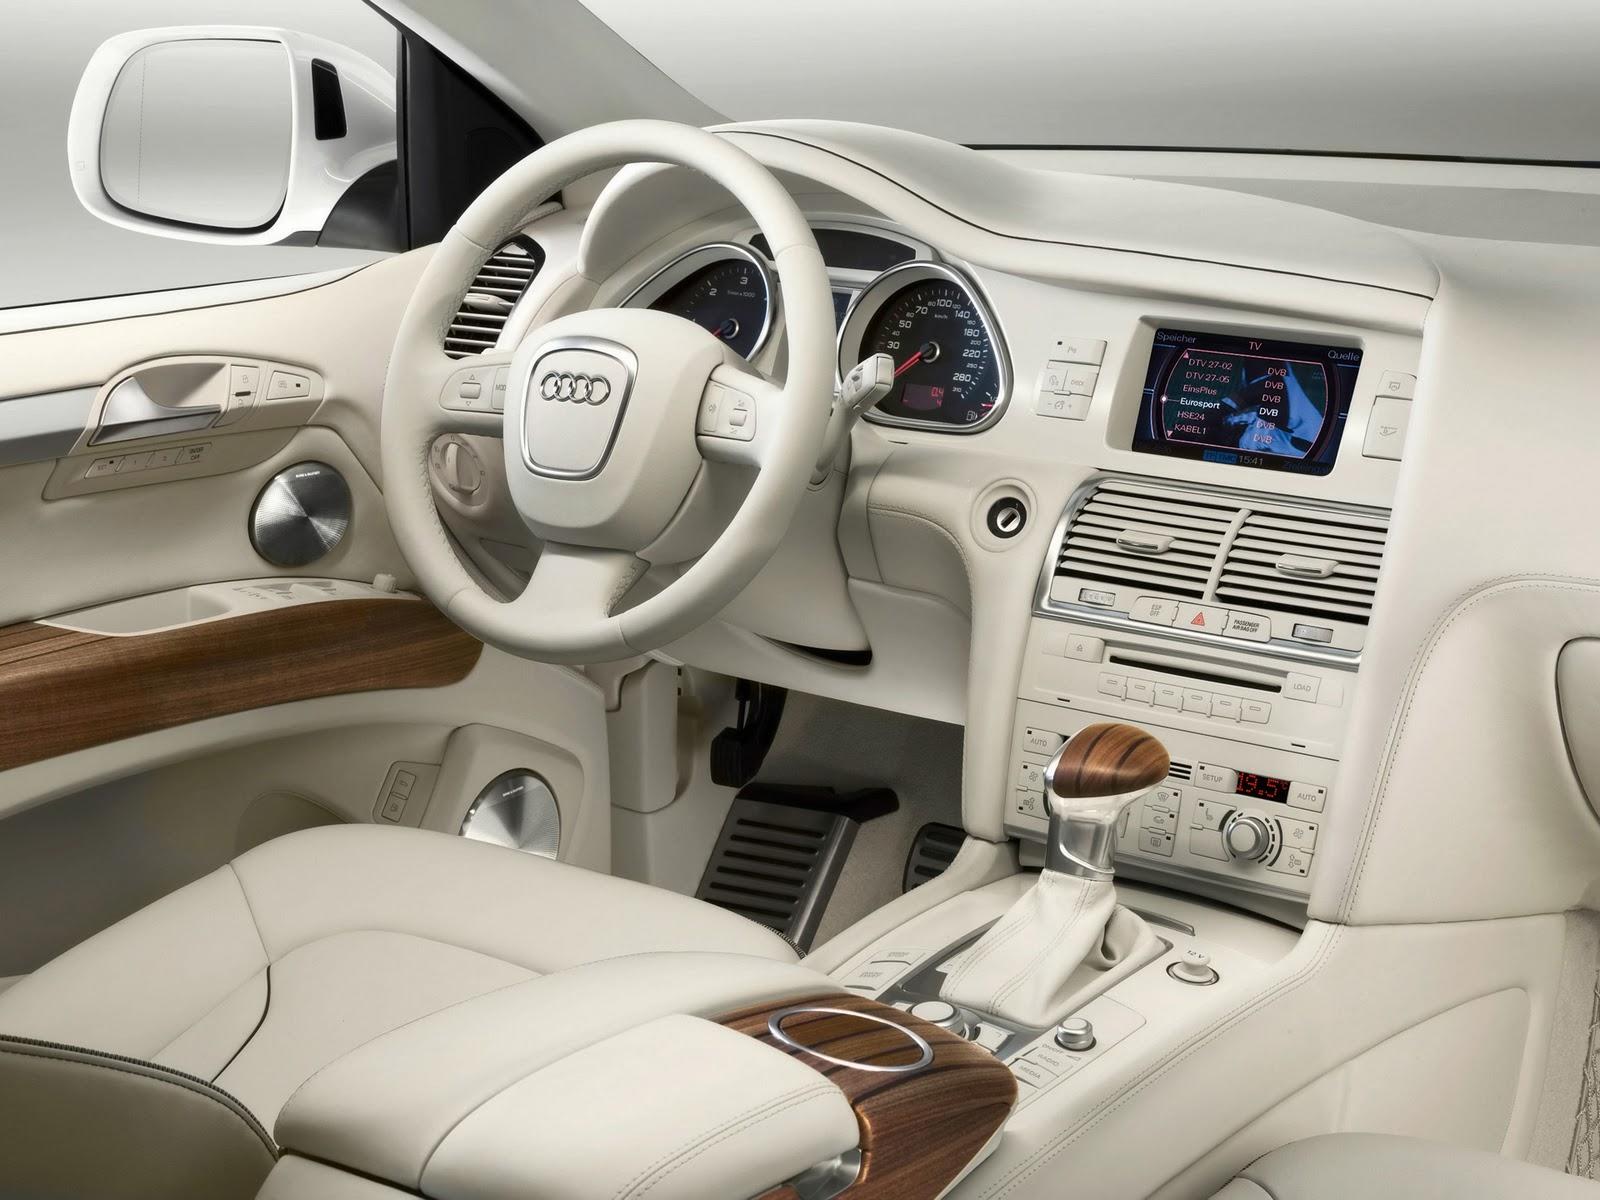 2008-Audi-Q7-V12-TDI-Coastline-Concept-Dashboard.jpg